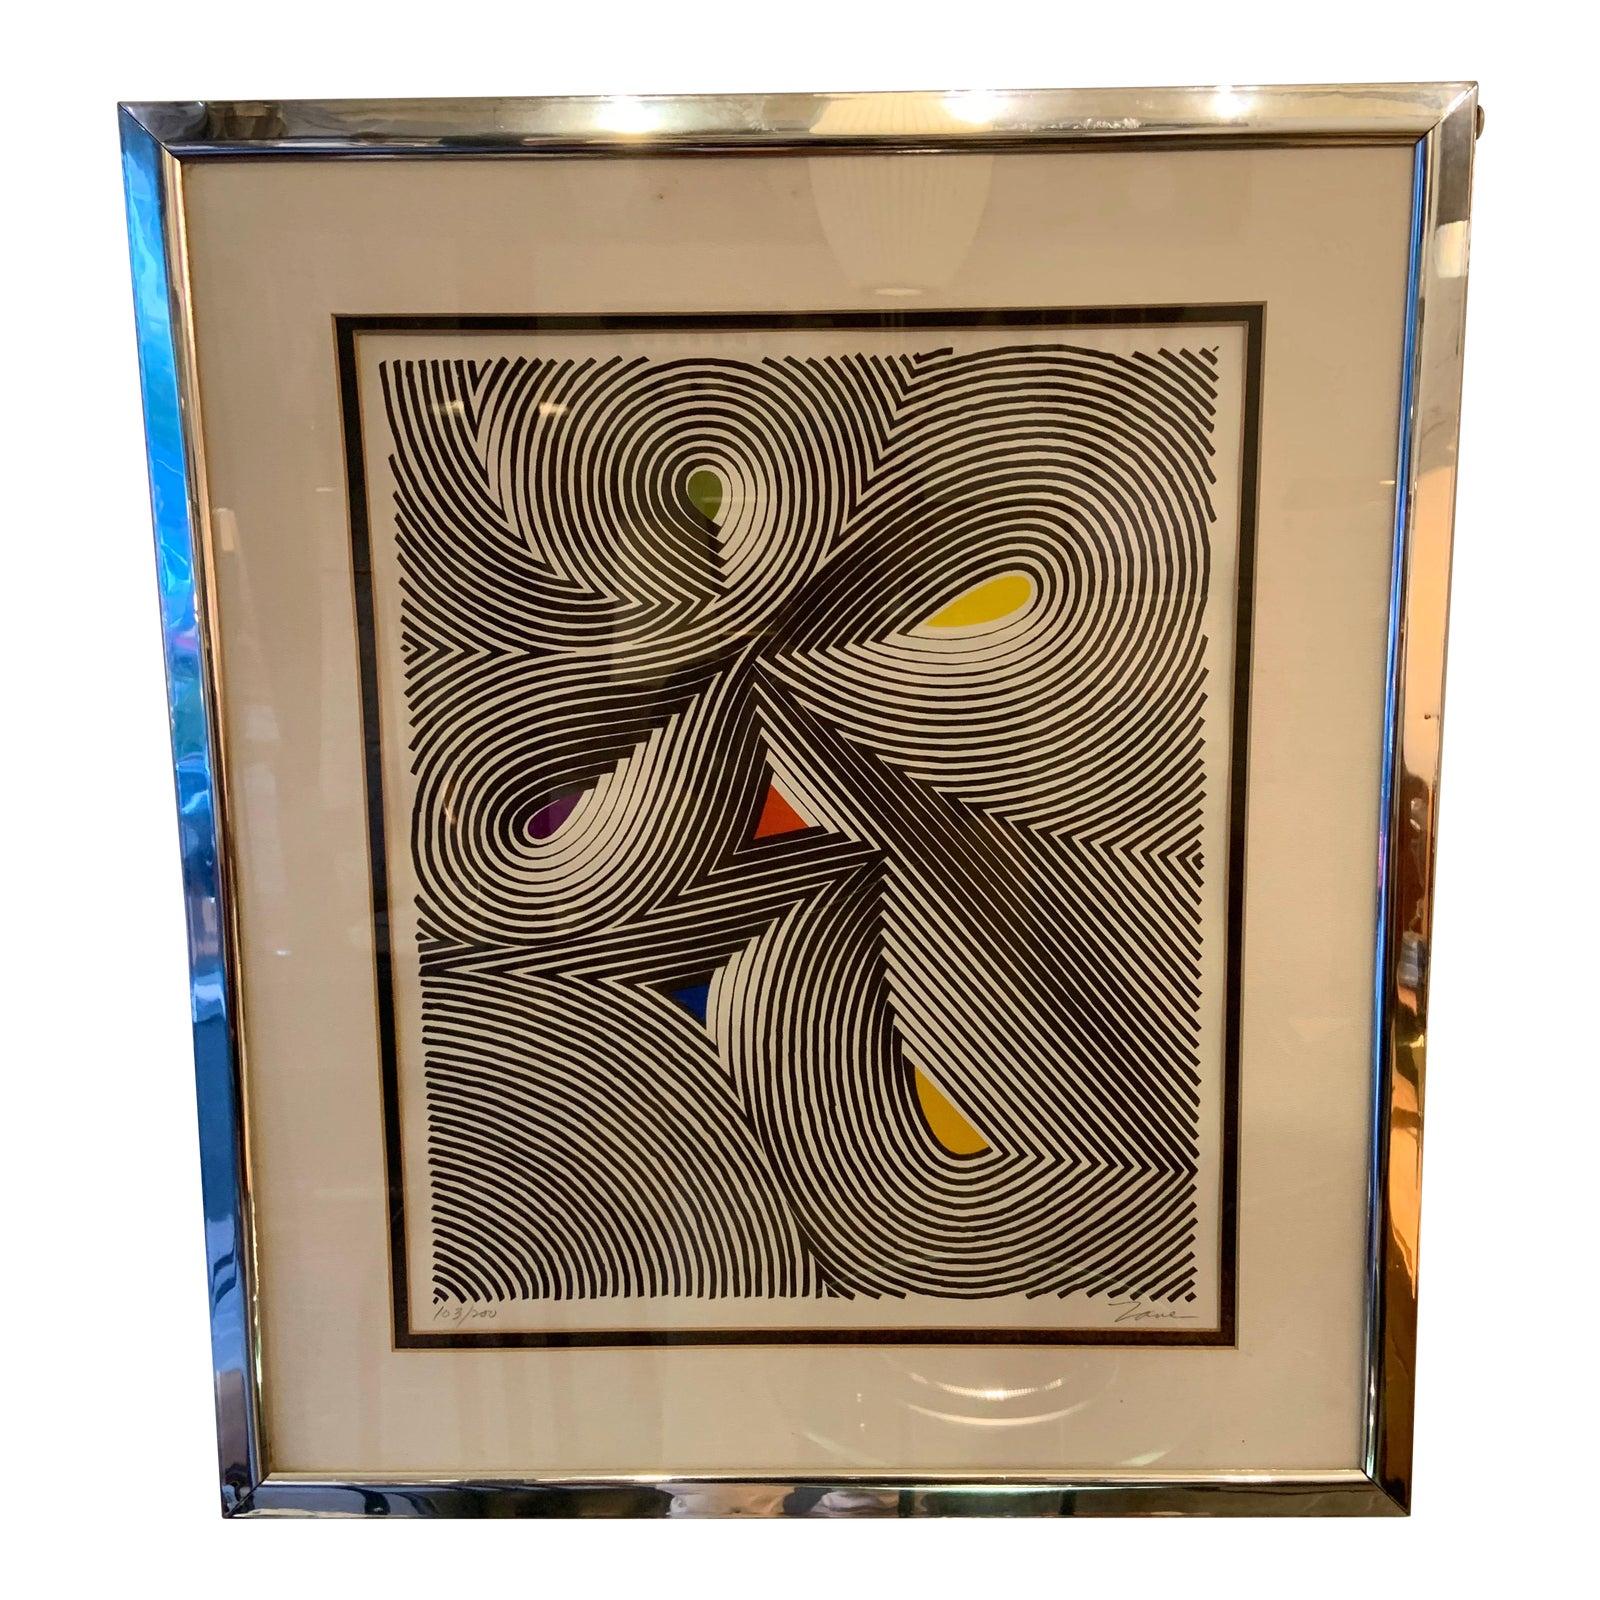 Framed 1970s Op Art Screen Print by Zane